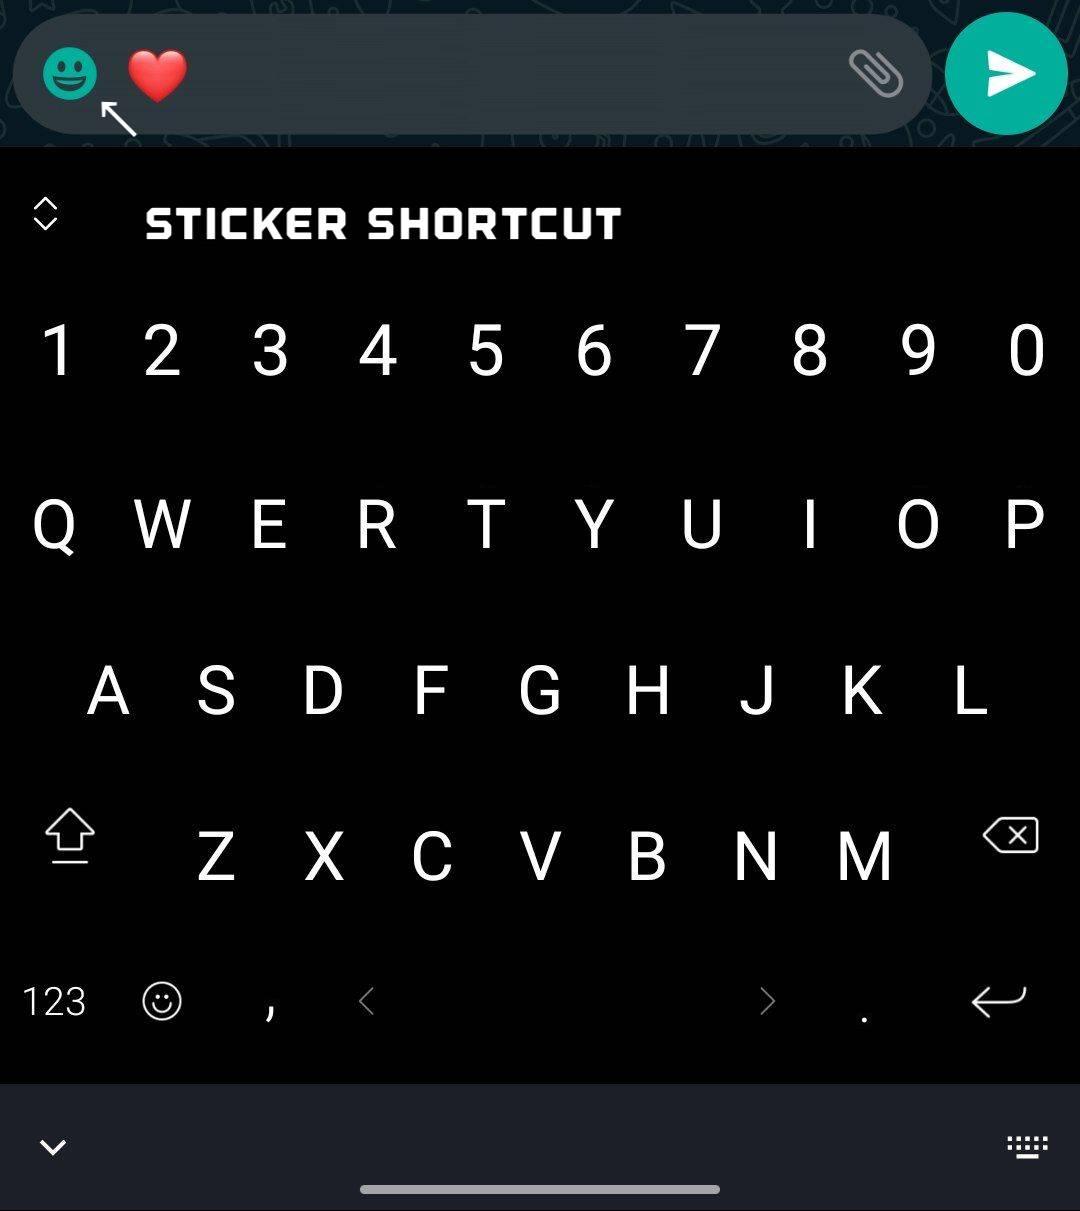 WhatsApp potrivire sticker